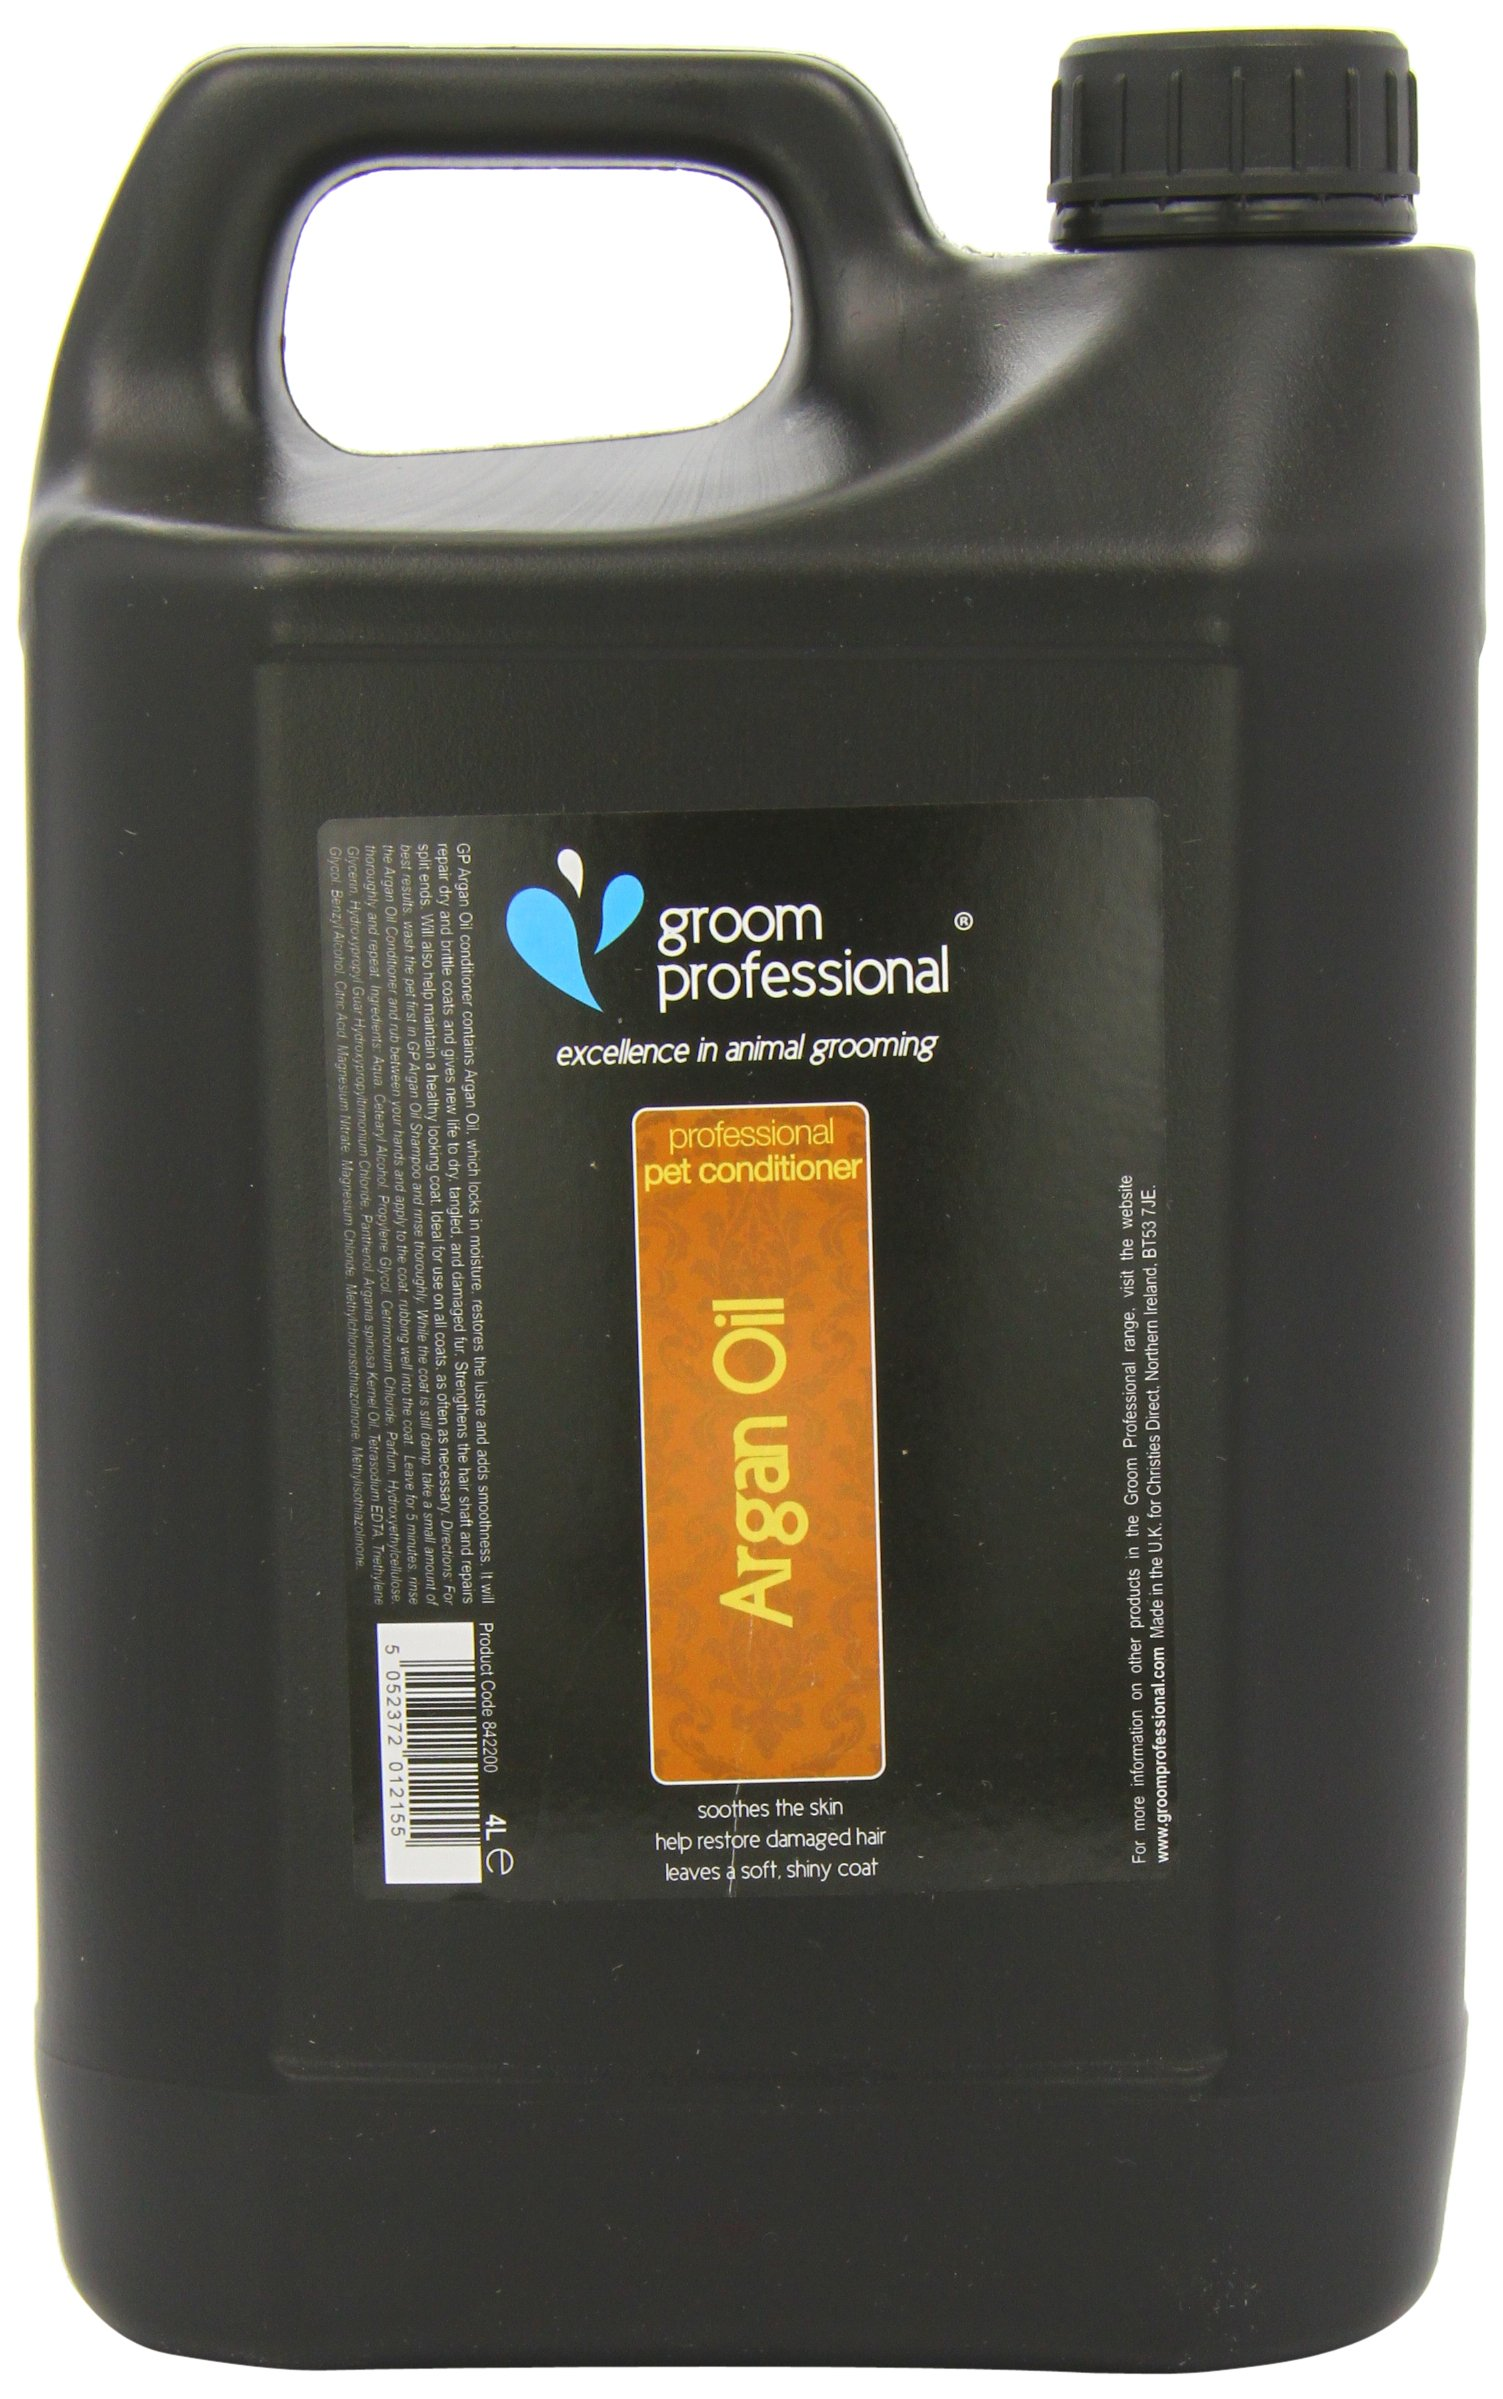 GROOM PROFESSIONAL Argan Oil Conditioner 4 Litre